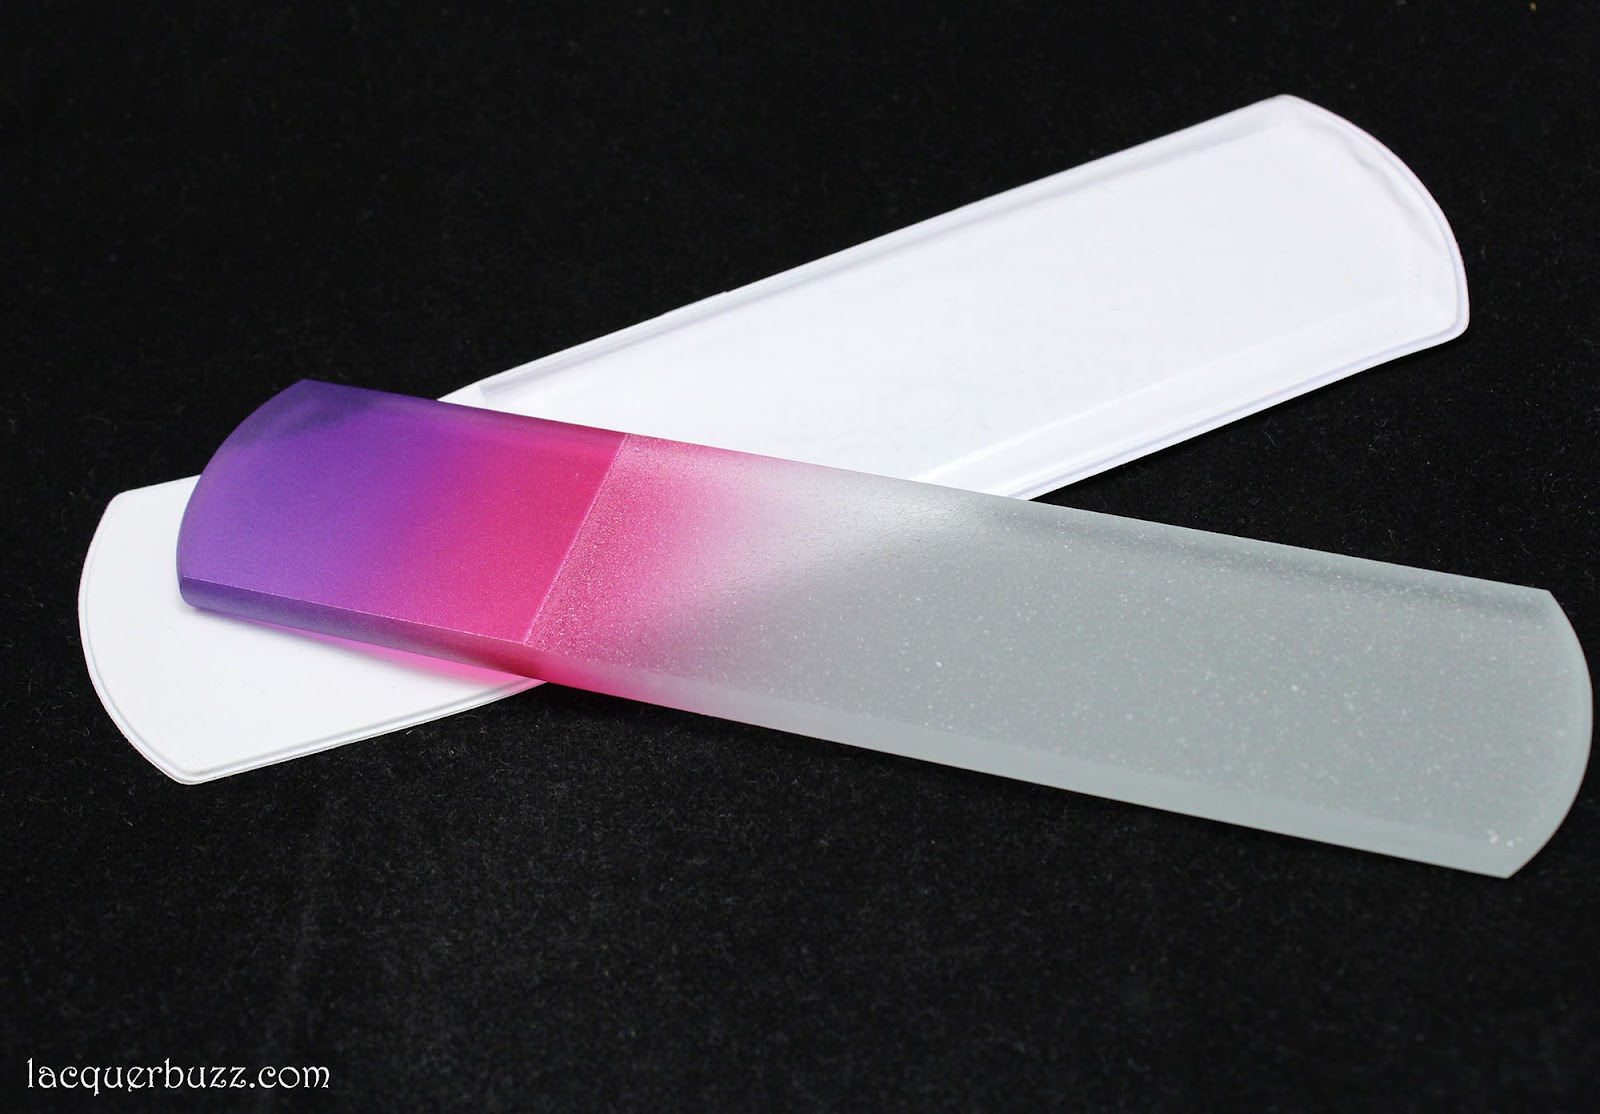 Lacquer Buzz: Aveniro Glass Nail File Review